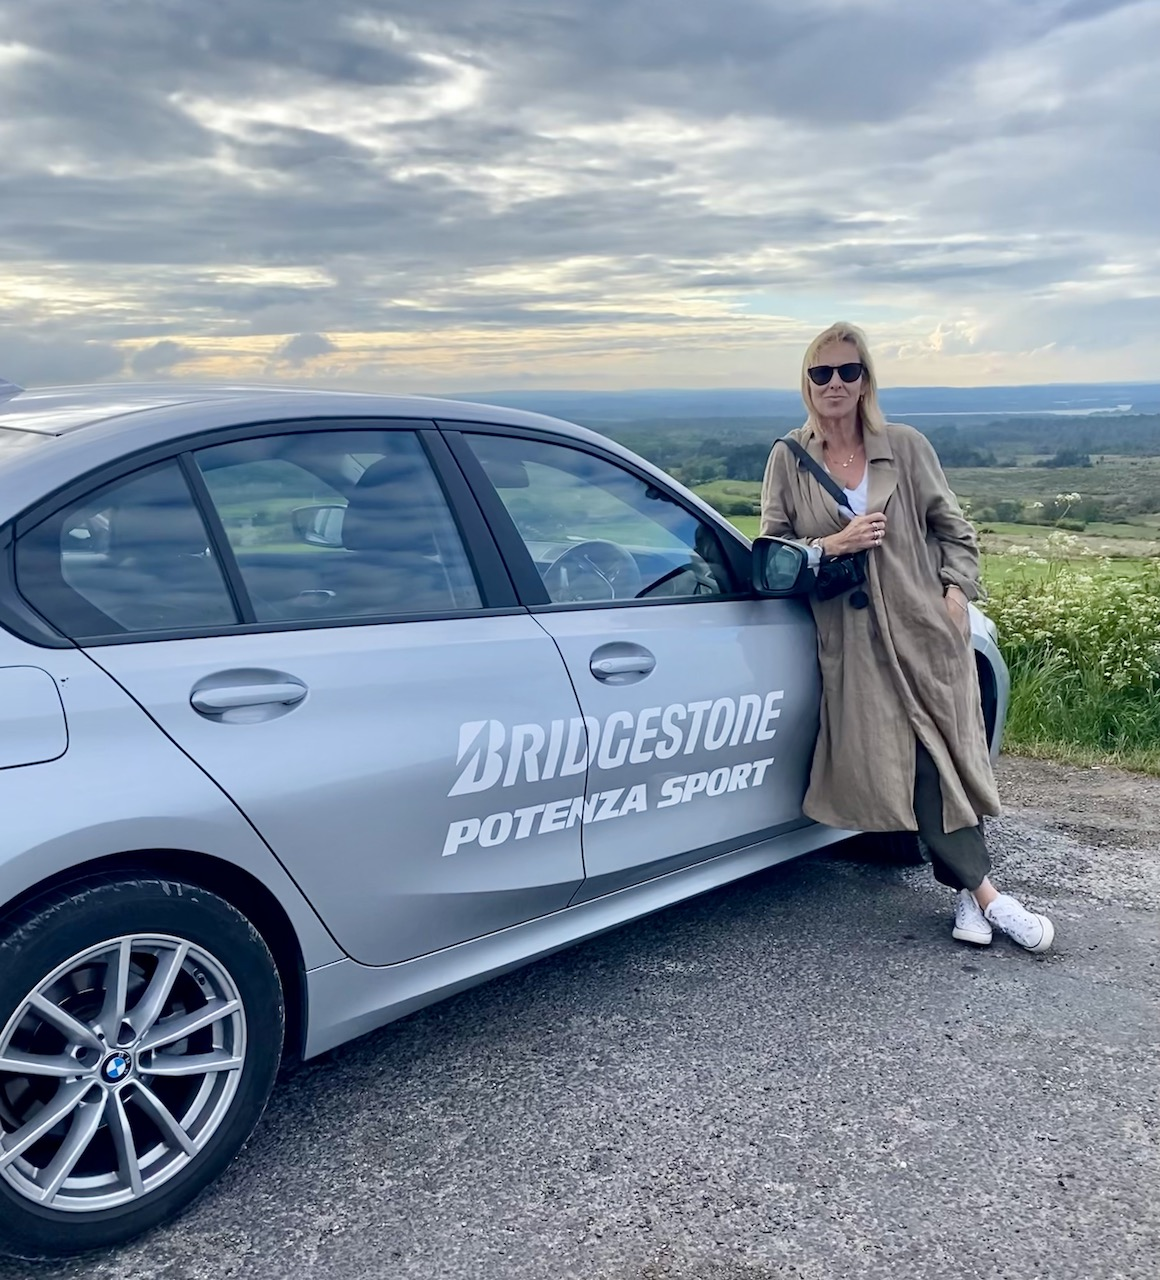 Dorset Jurrasic Coast Road Trip - Lucy on the road with Bridgestone Potenza